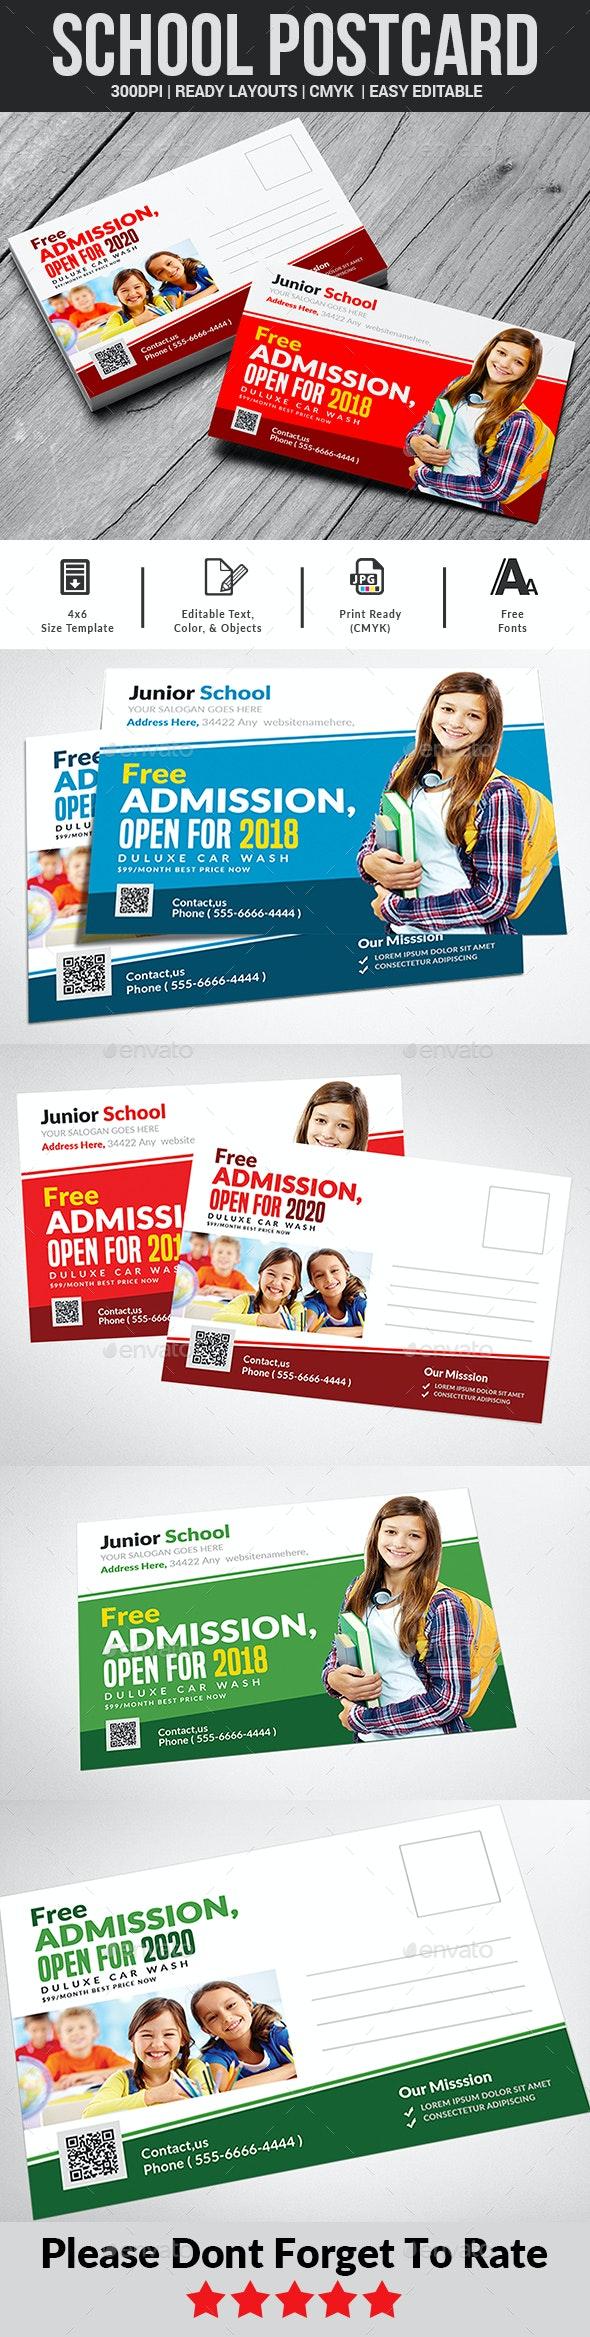 Junior School Education Postcard - Cards & Invites Print Templates